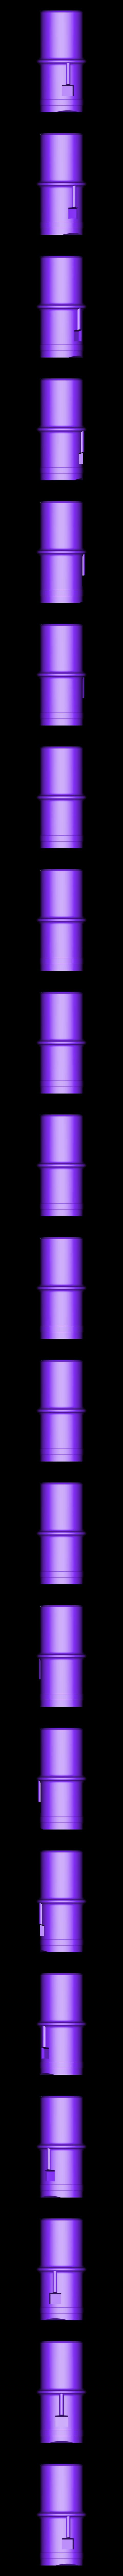 Embout Intermediaire LG Kompressor - Vaccum - v1.stl Download free STL file LG Kompressor Vaccum Tip Adapter • 3D print design, LAFABRIK3D